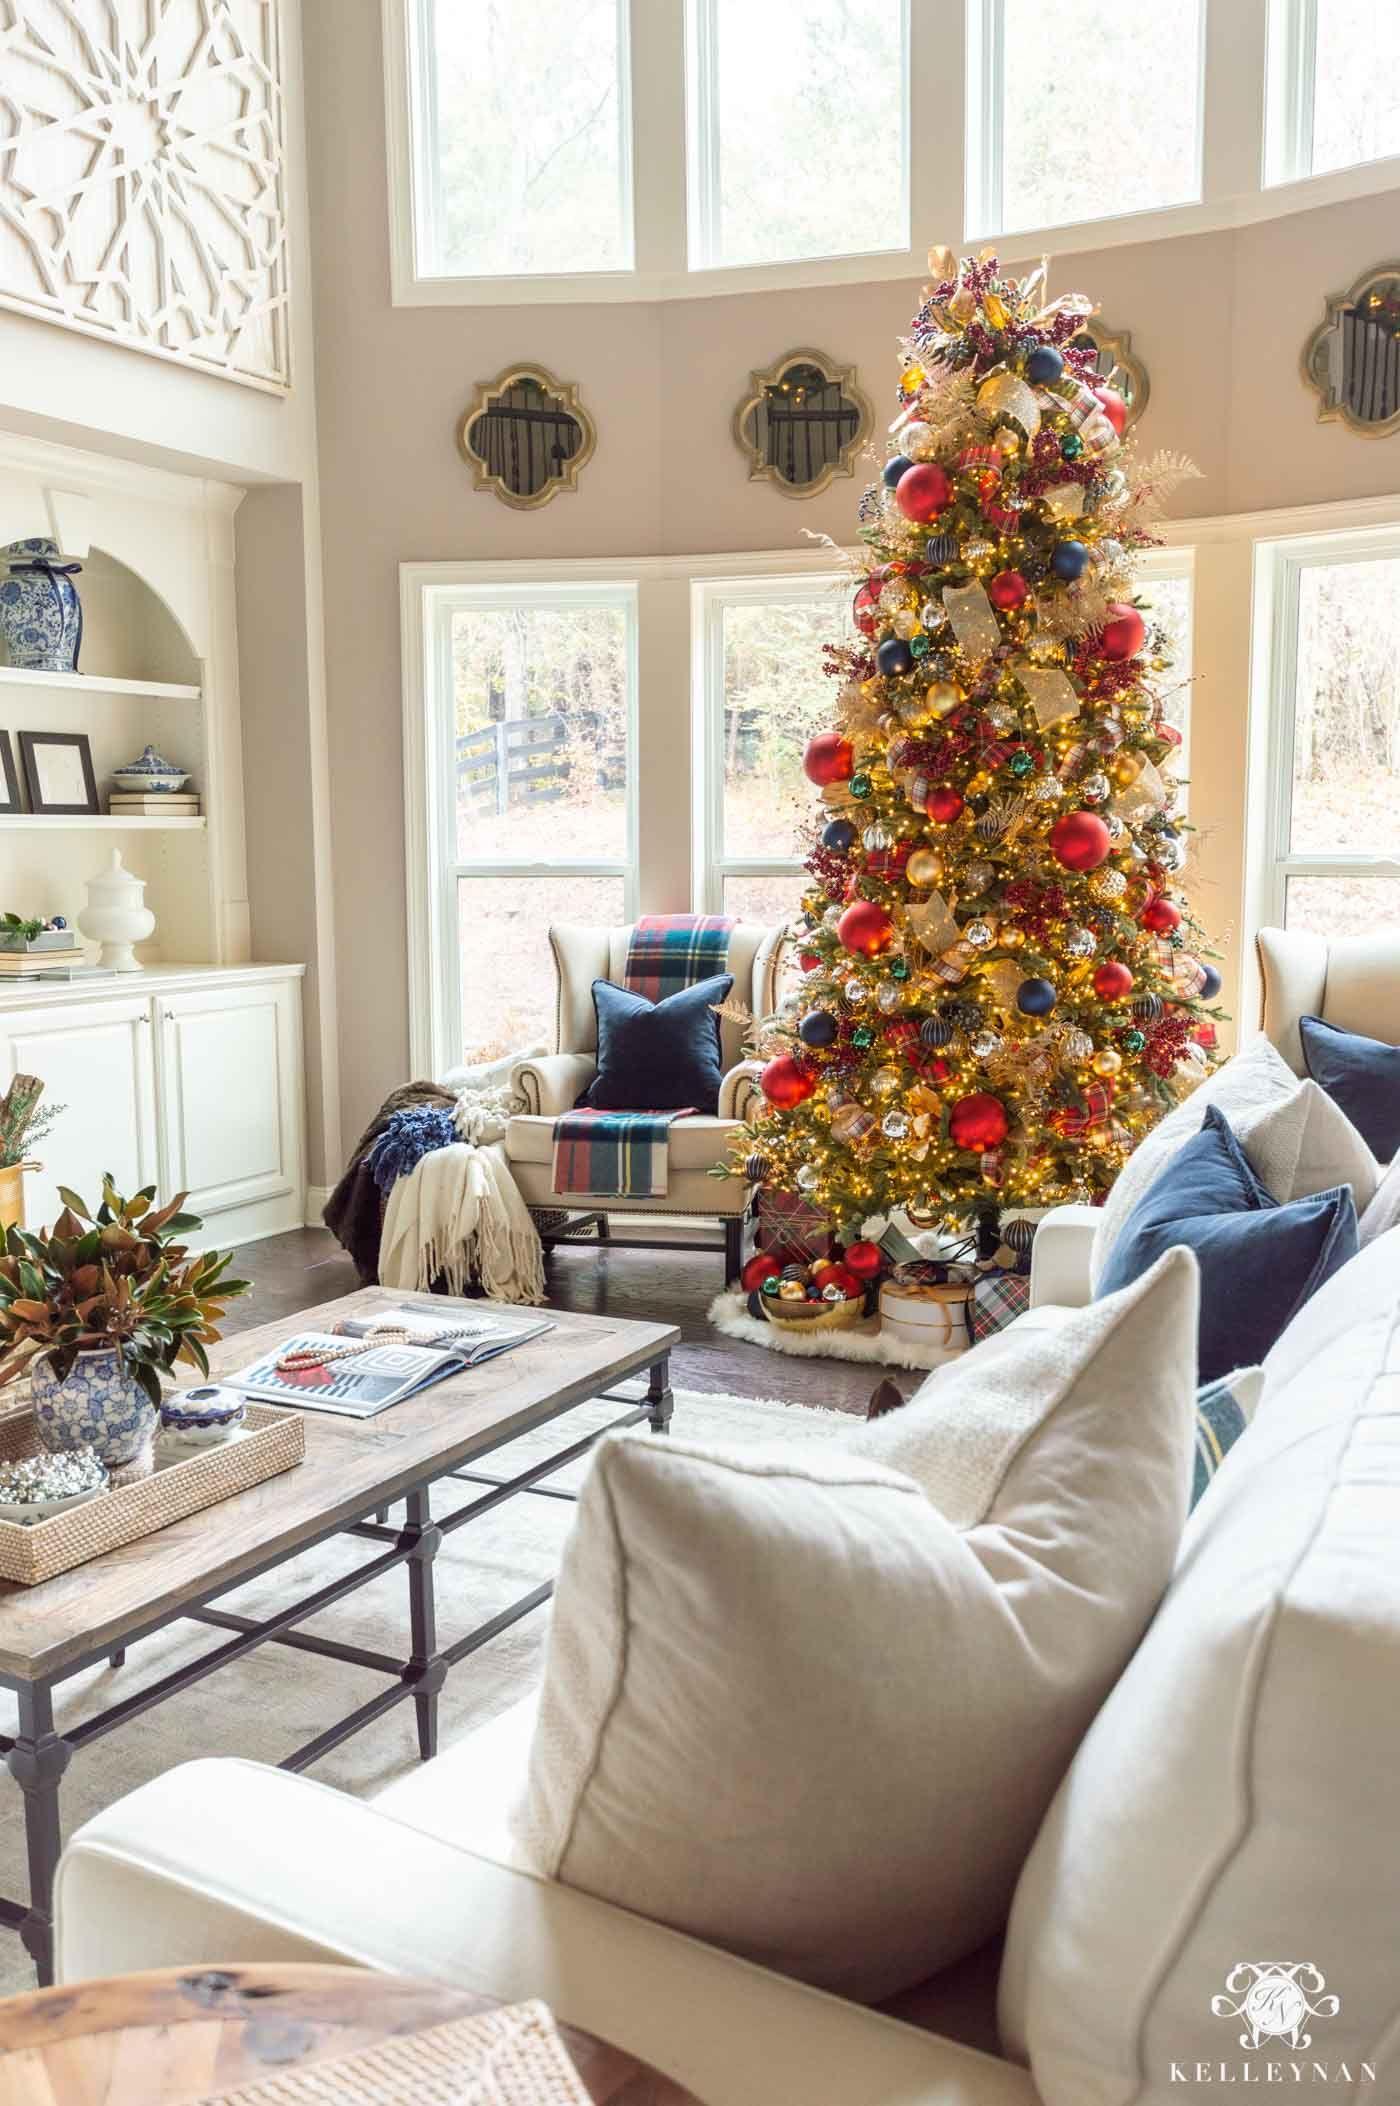 Tartan Plaid Themed Christmas Home Tour Kelley Nan In 2020 Traditional Christmas Decorations Plaid Christmas Decor Christmas Decorations For The Home